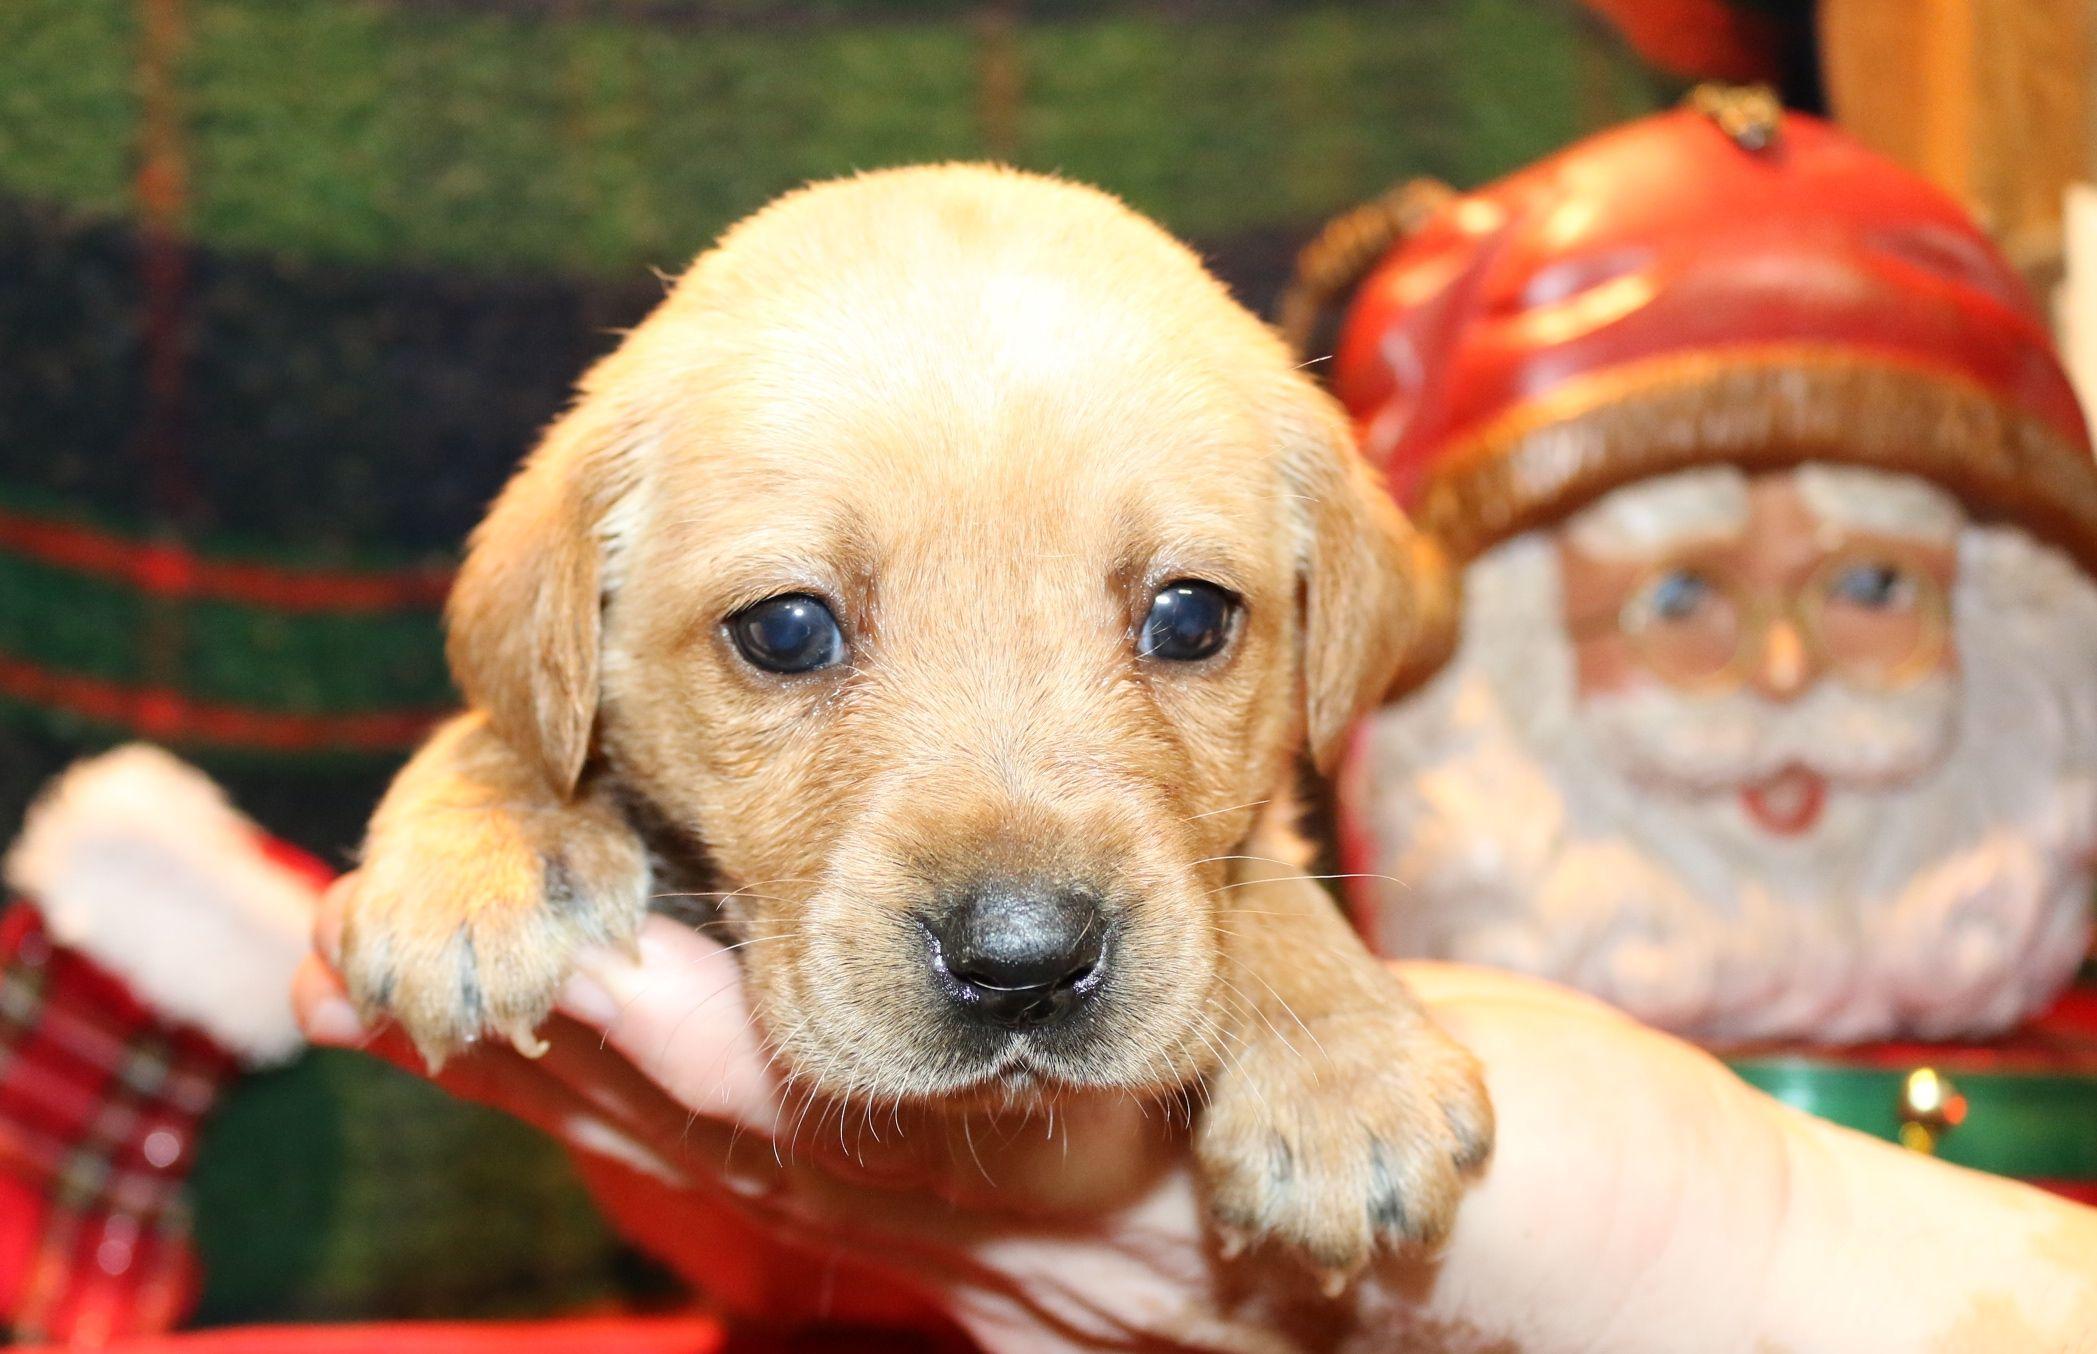 Christmas Puppies Who Needs A Yellow Labrador Retriever Labrador Puppies For Sale Puppies For Sale Yellow Labrador Retriever